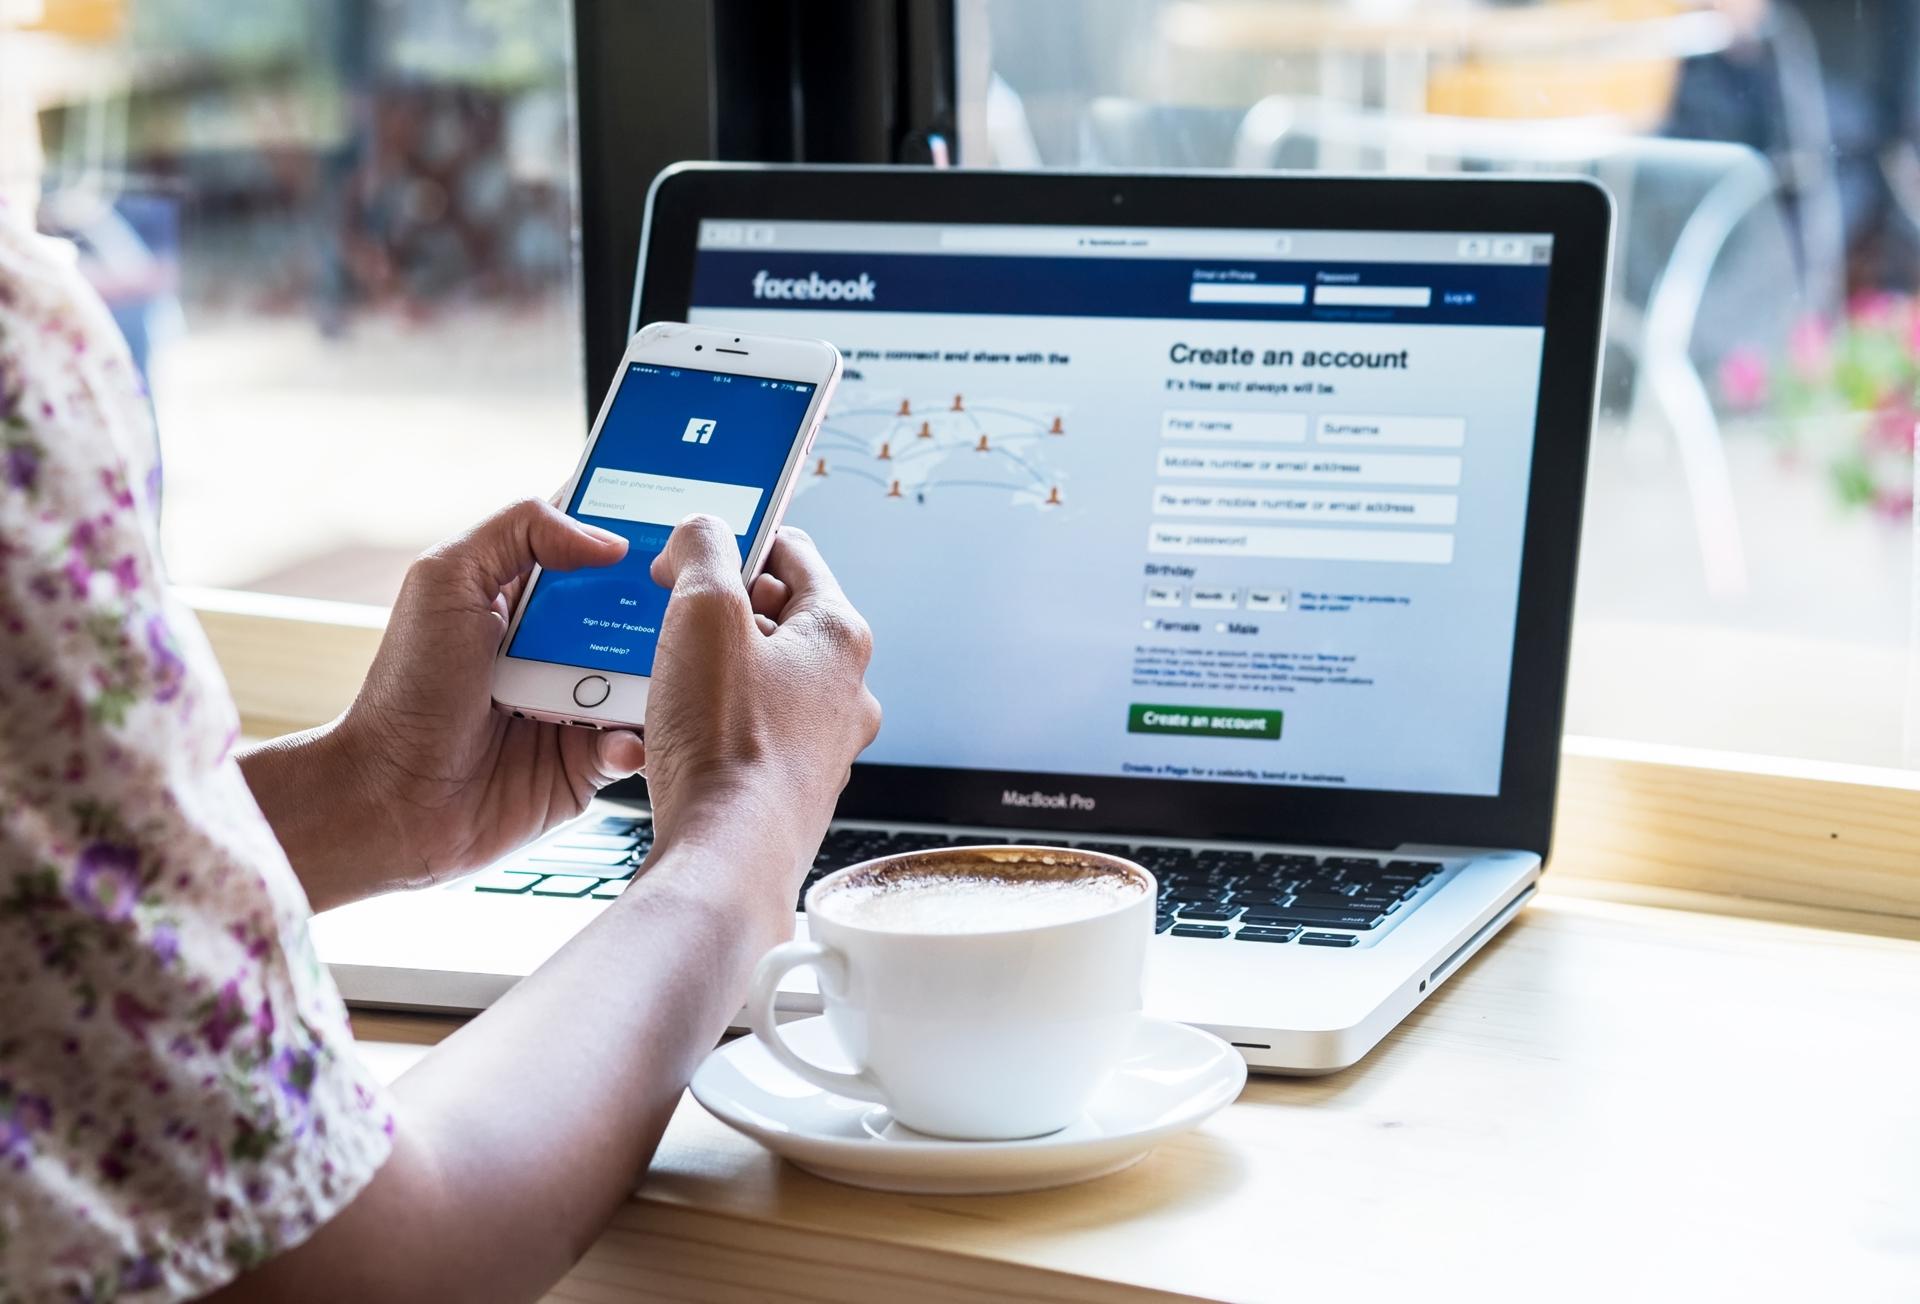 Social Media Marketing: Hacking Facebook for Brand Awareness